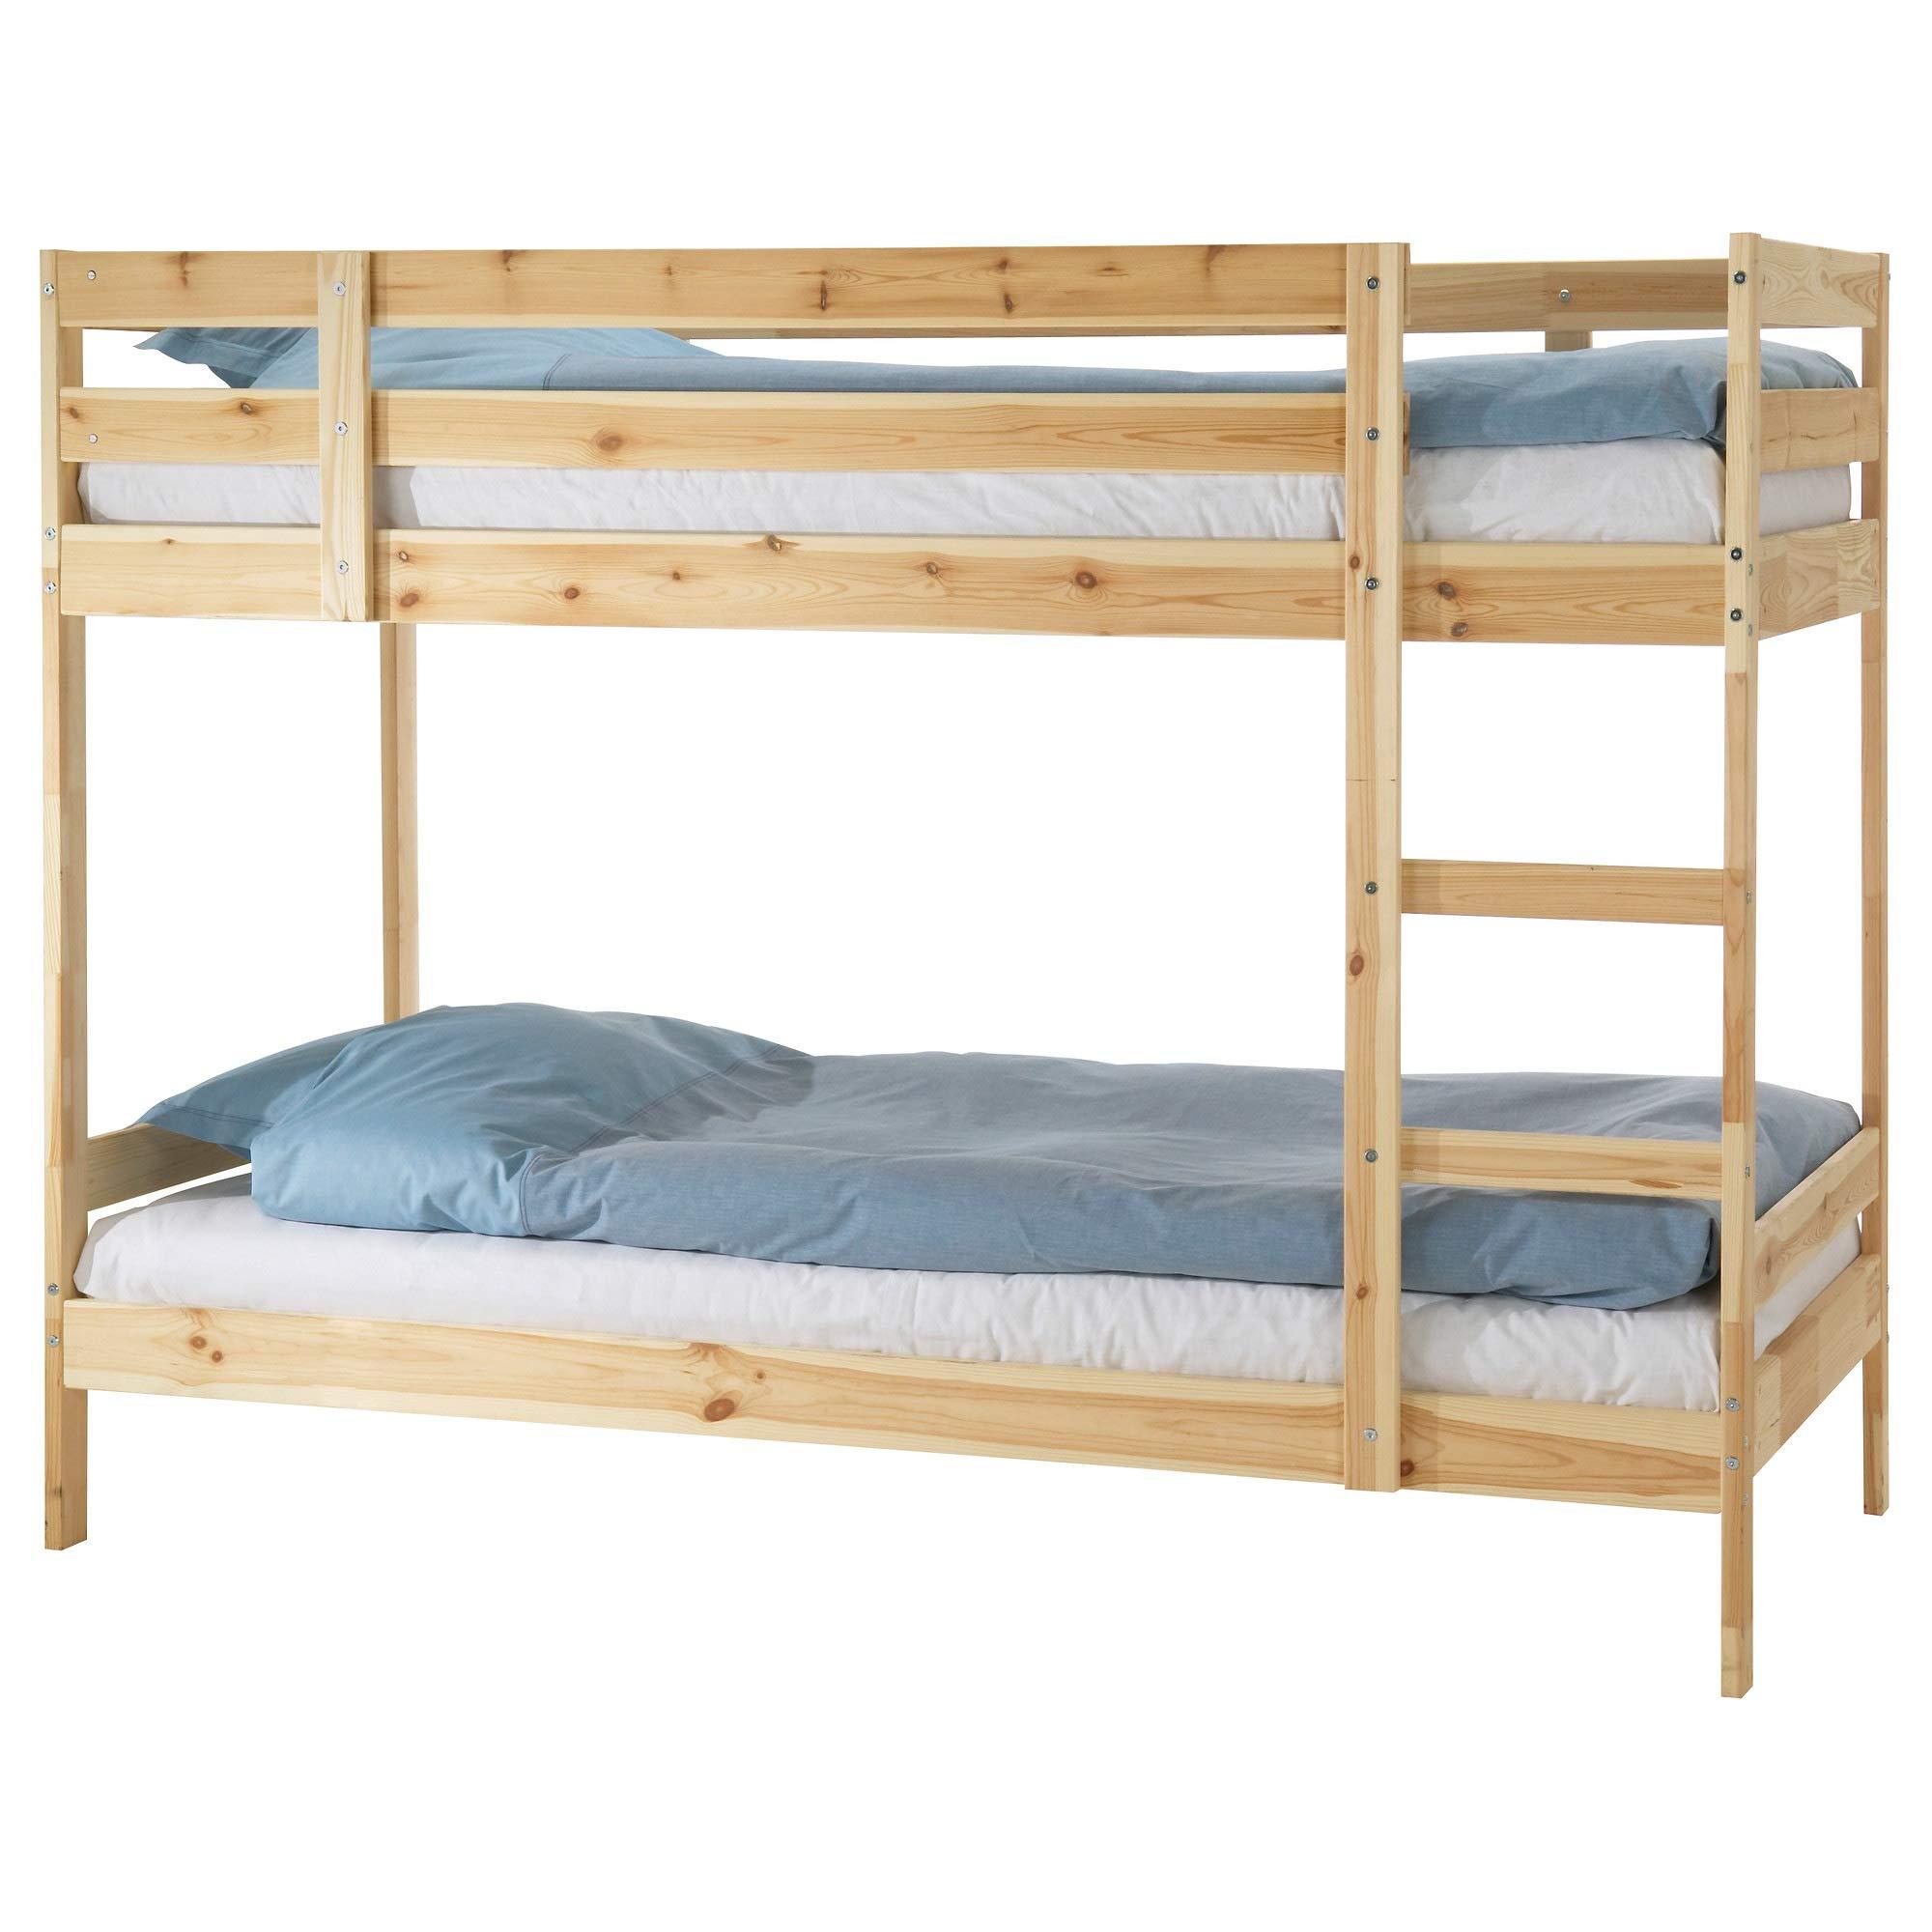 IKEA.. 201.024.51 Mydal Bunk Bed Frame, Pine